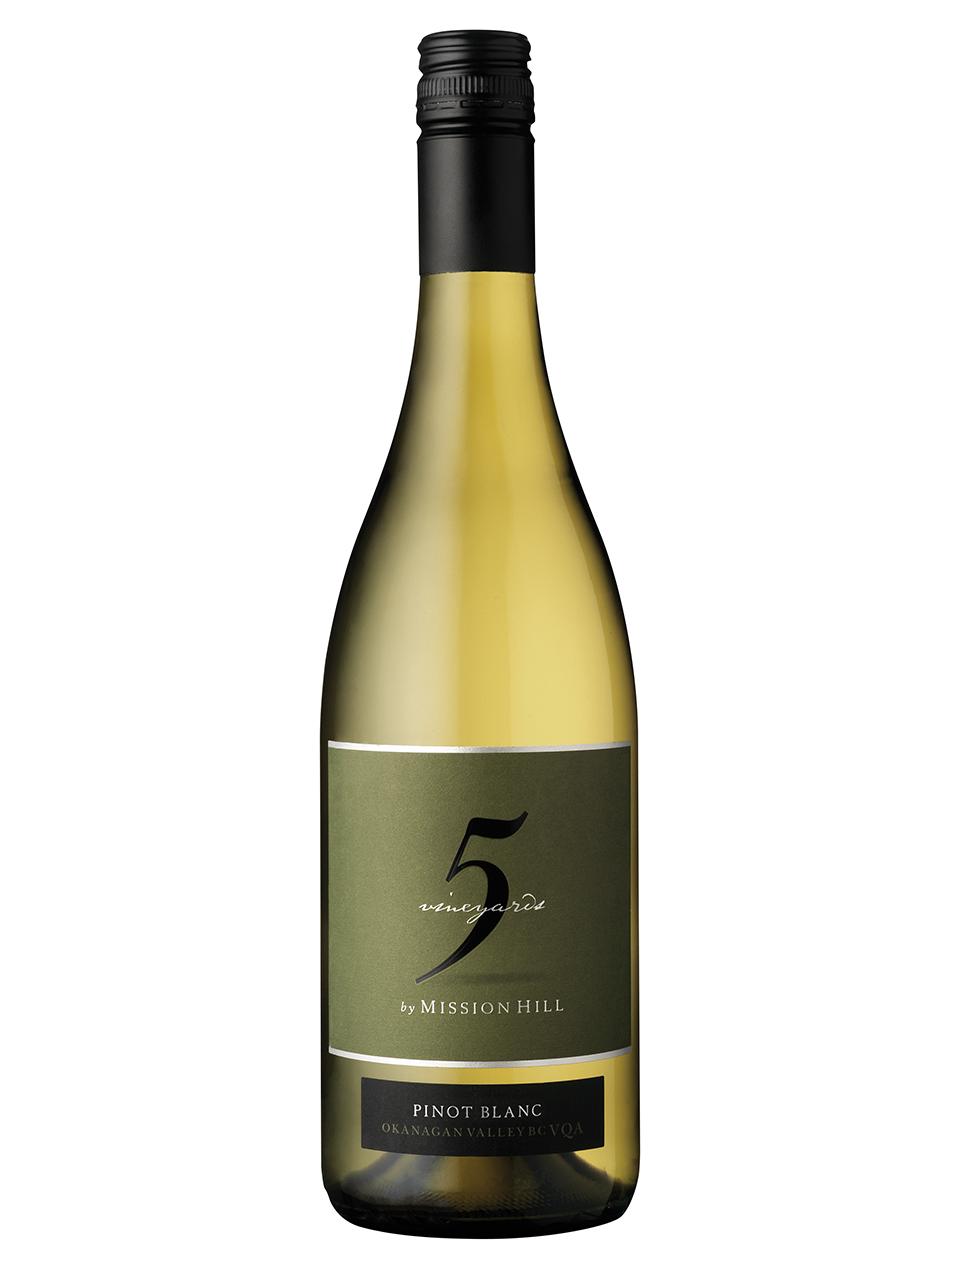 Mission Hill Five Vineyards Pinot Blanc VQA